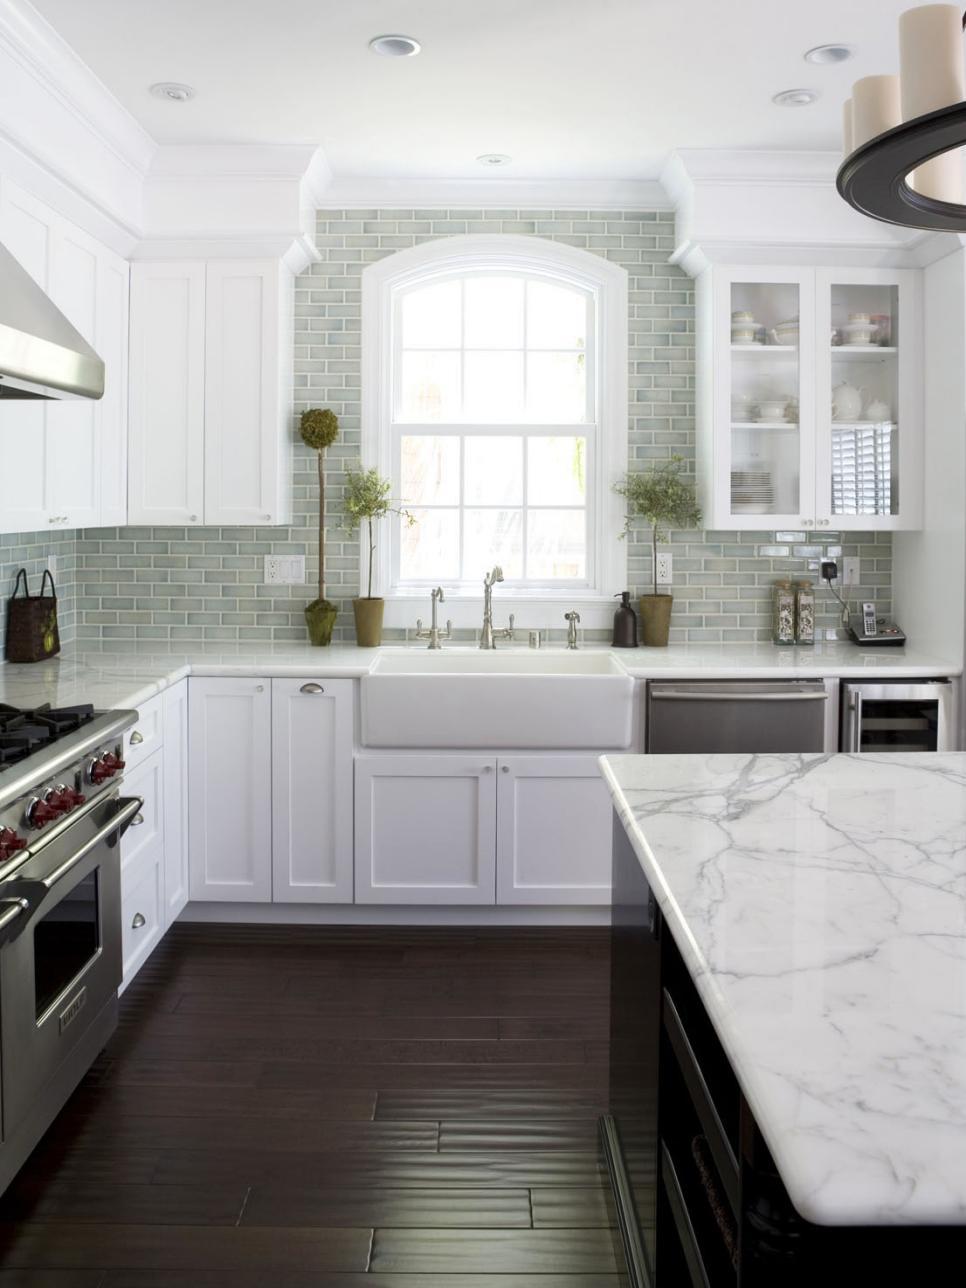 White Kitchen With Tile Backsplash Hgtv